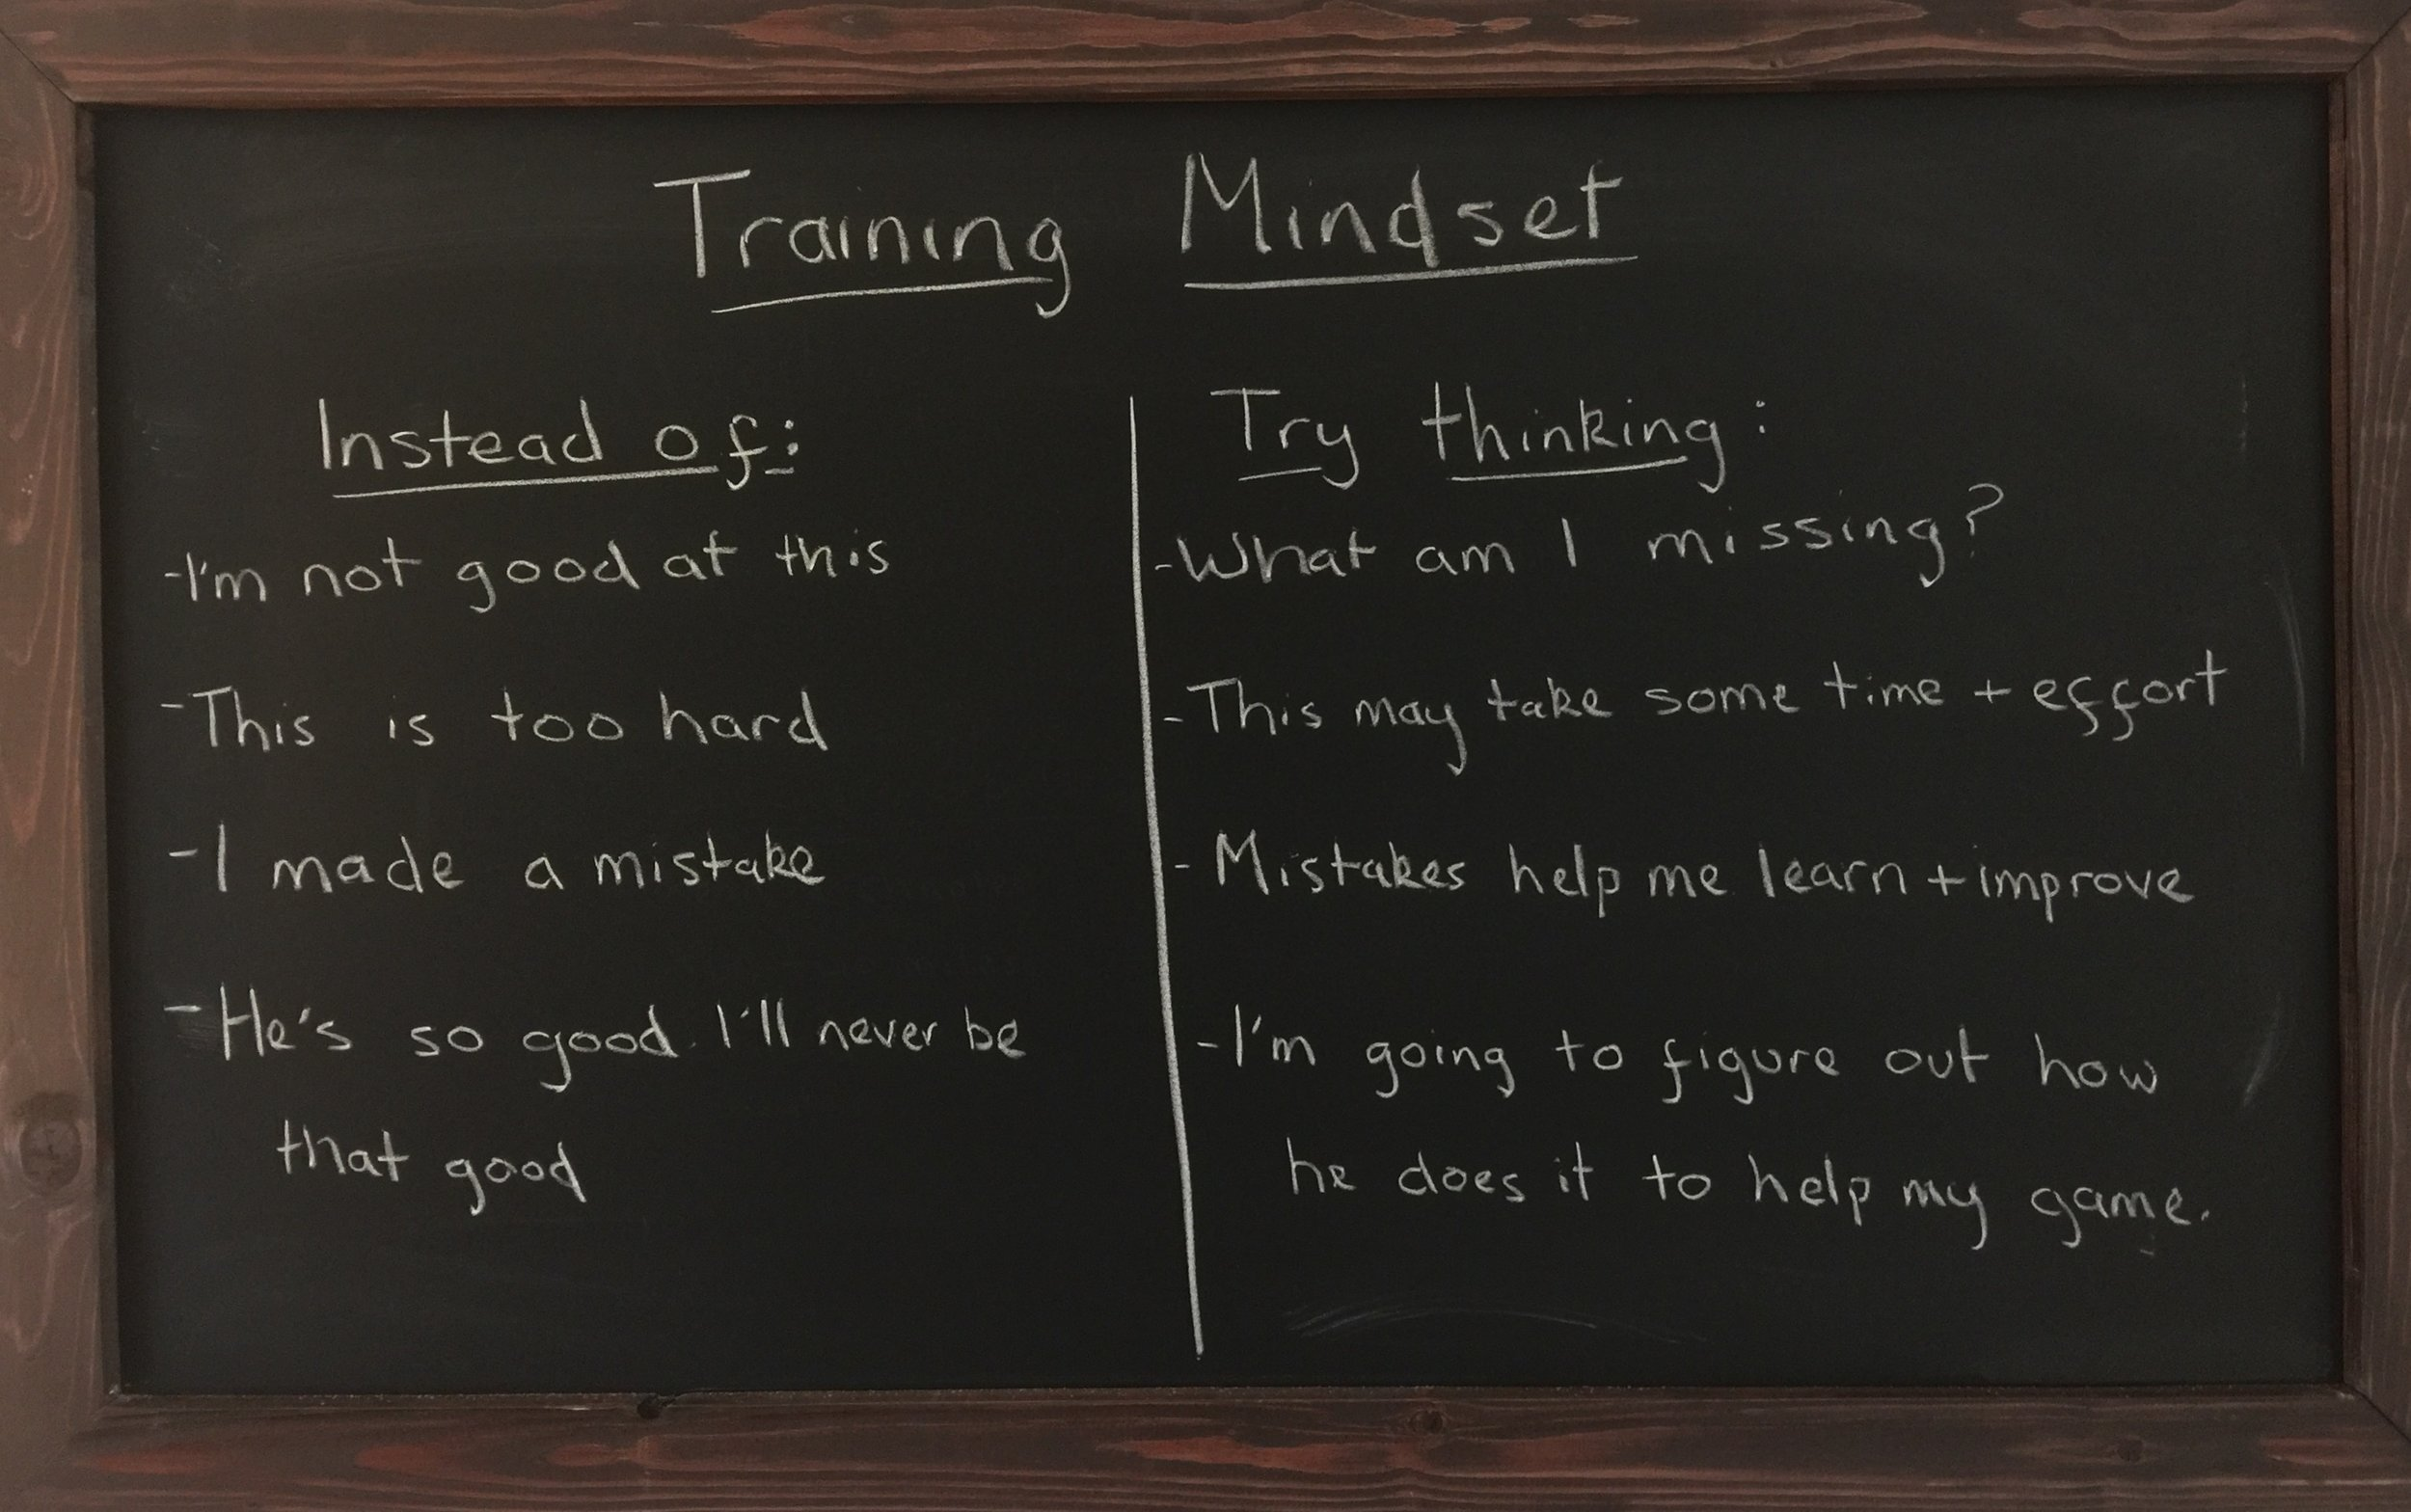 training mindset.jpg